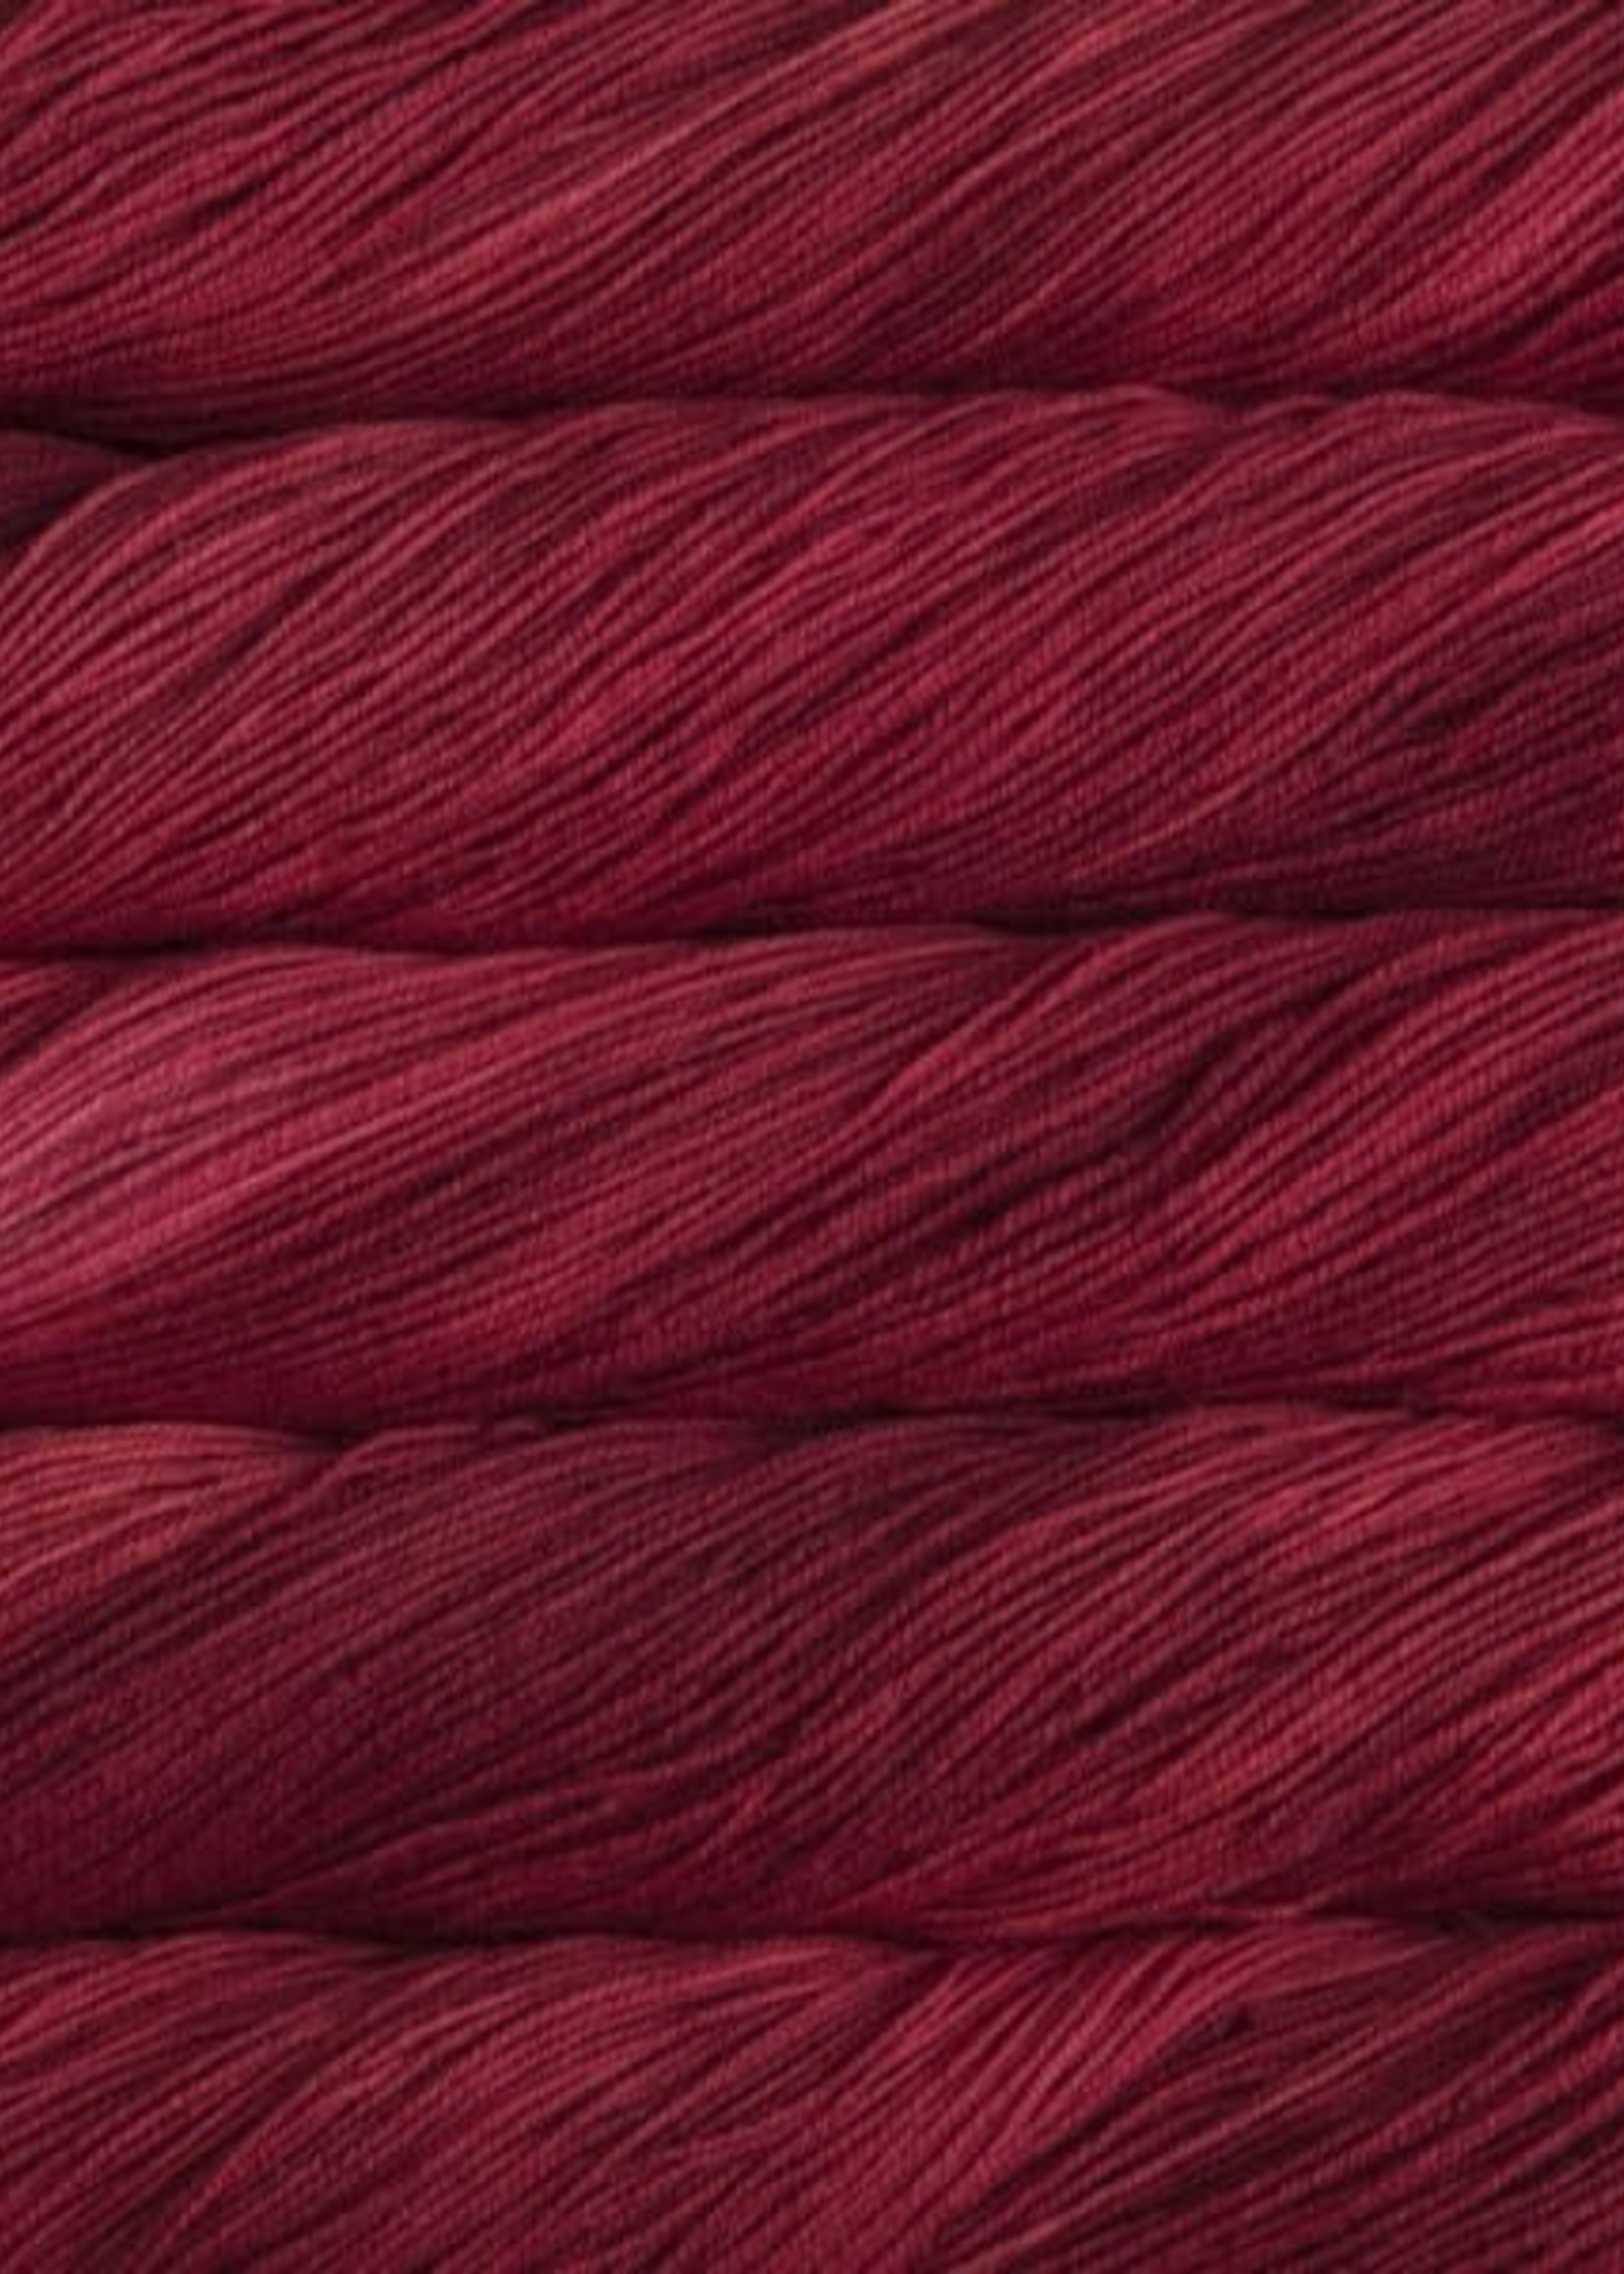 Malabrigo Yarn Malabrigo Sock Yarn #611 Ravelry Red